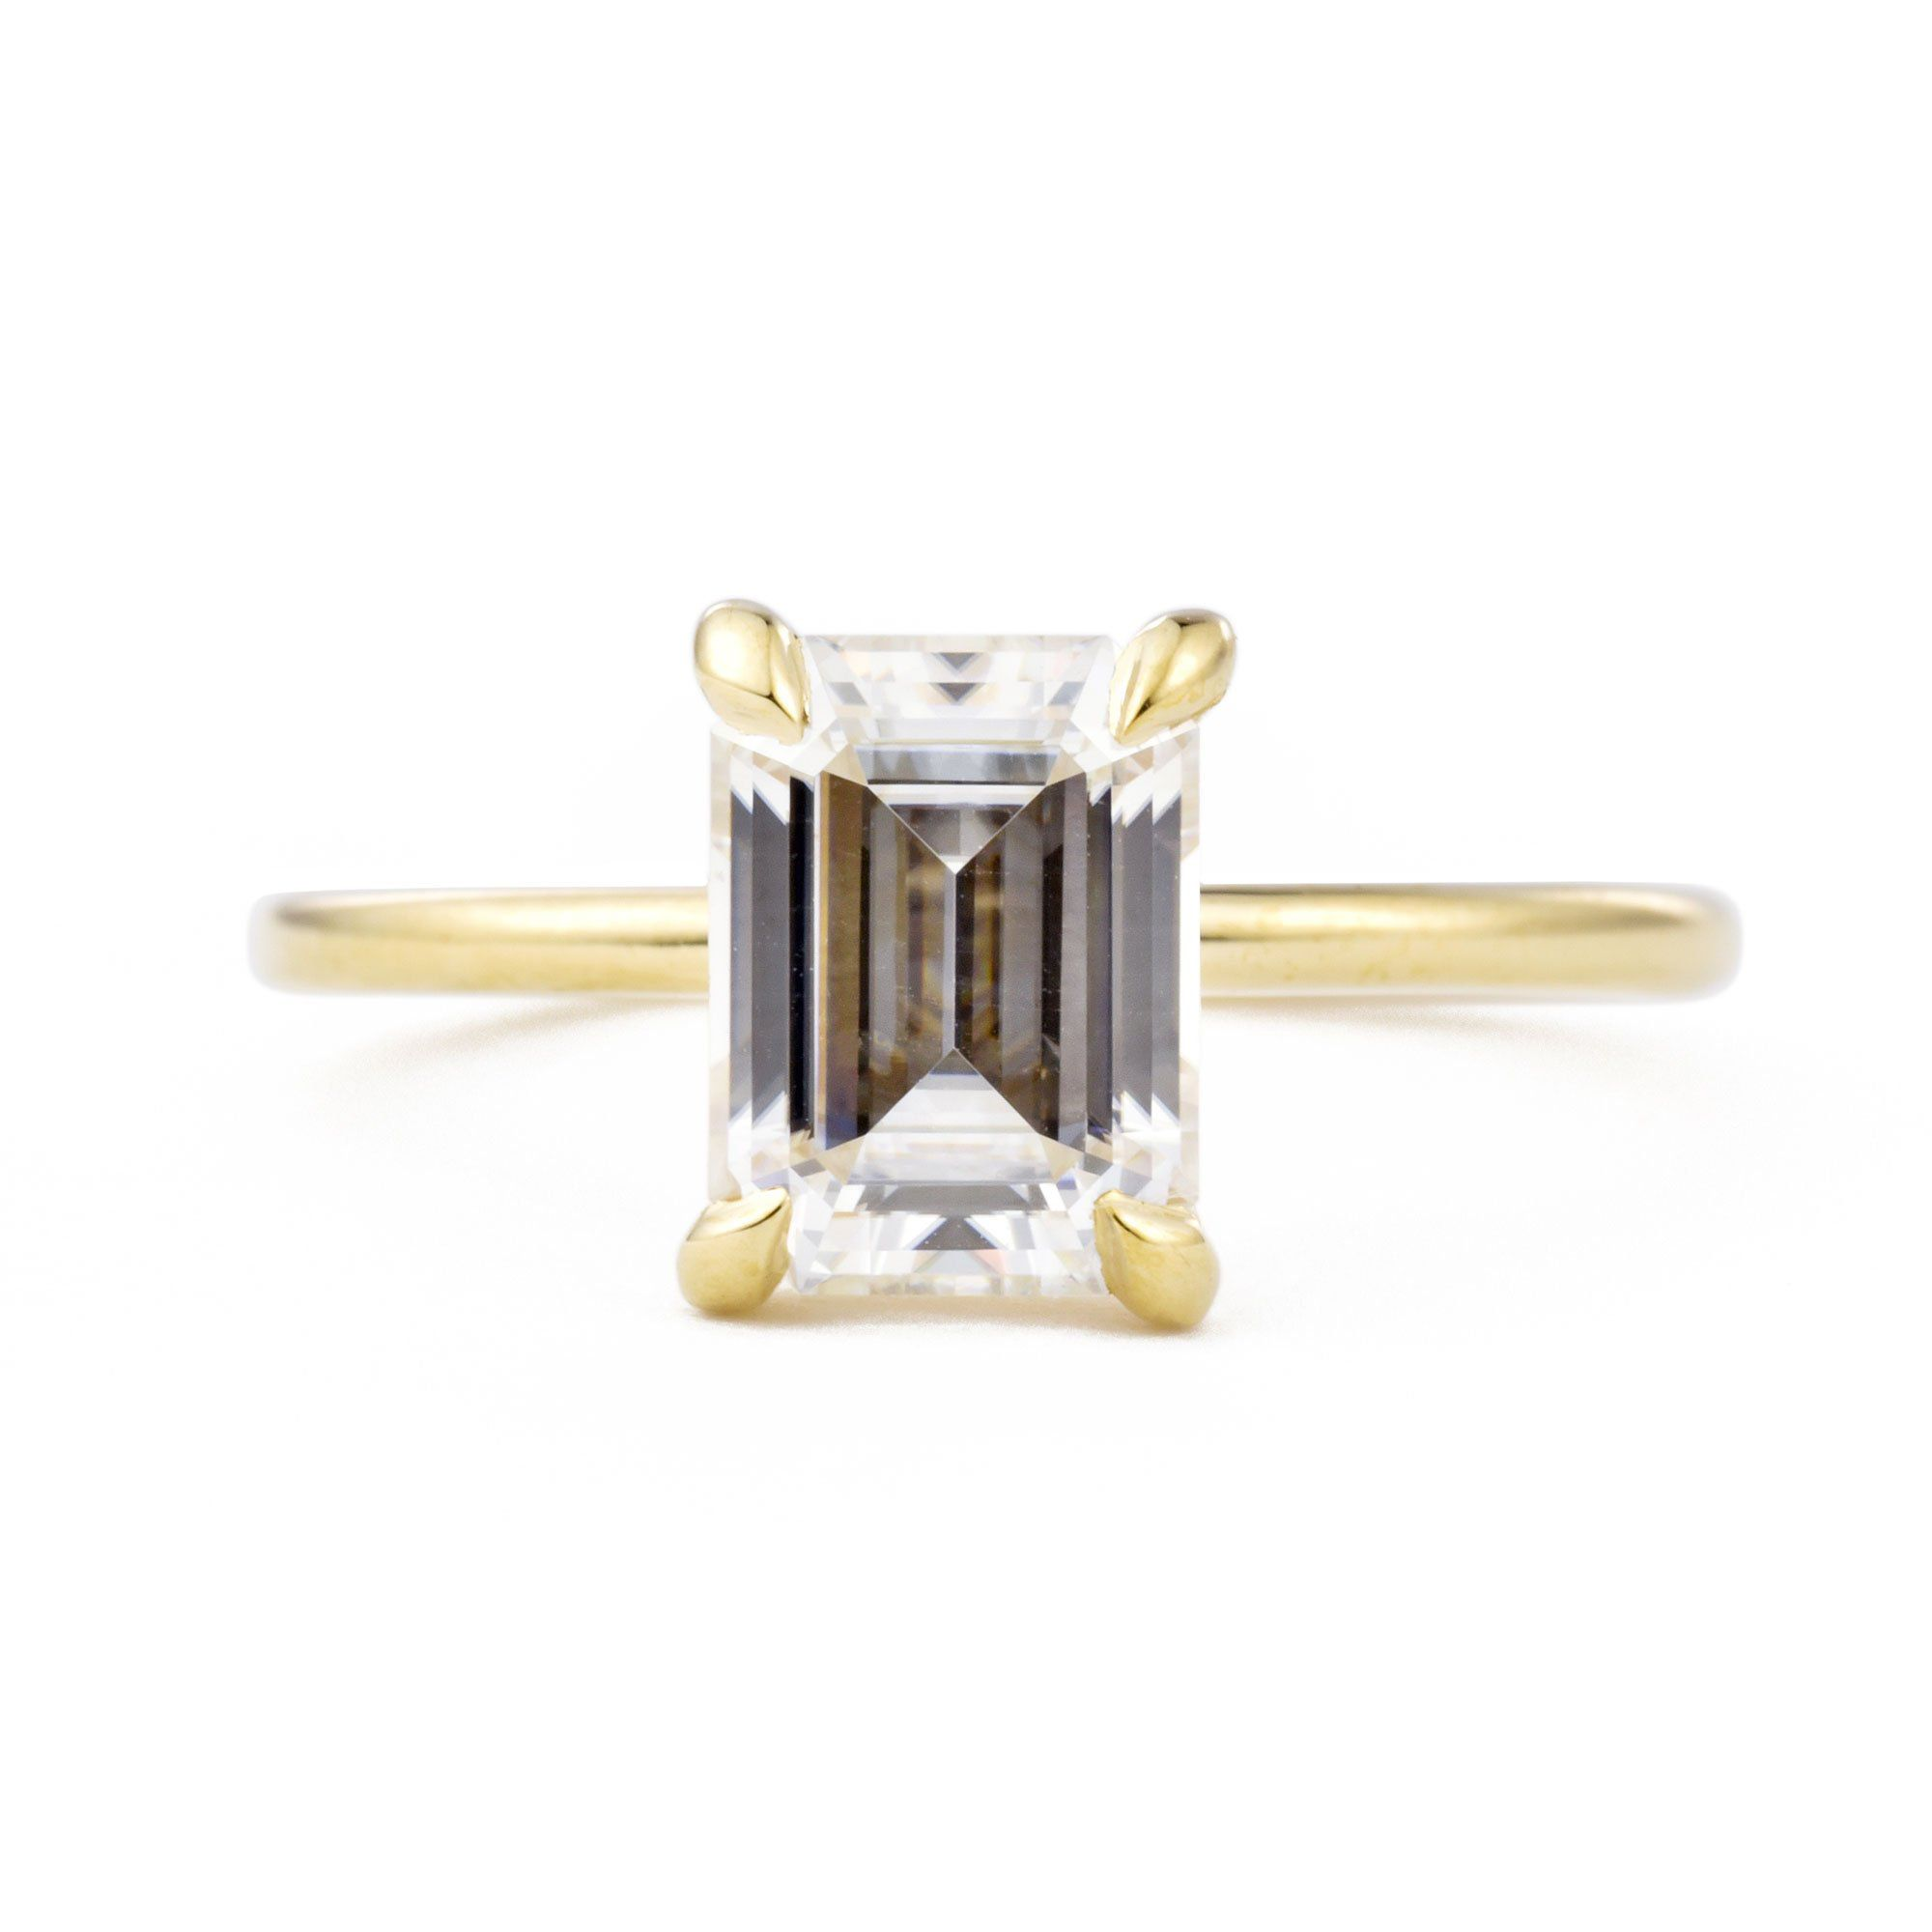 Vera Emerald Cut Moissanite Solitaire Engagement Ring